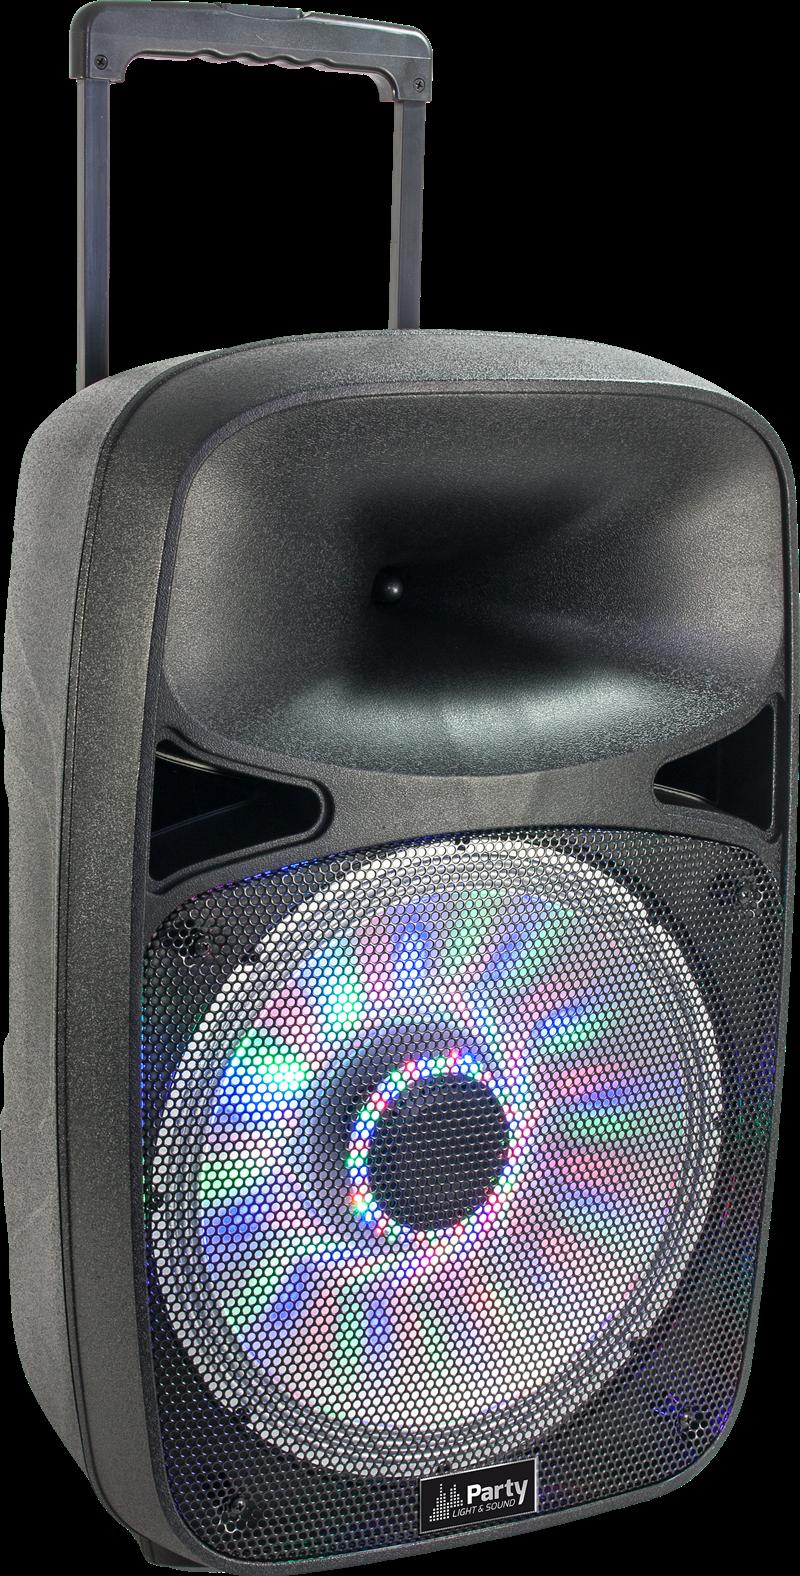 Billede af PORTABLE SOUND SYSTEM WITH USB, BLUETOOTH & VHF MIC 12''/30cm - 500W